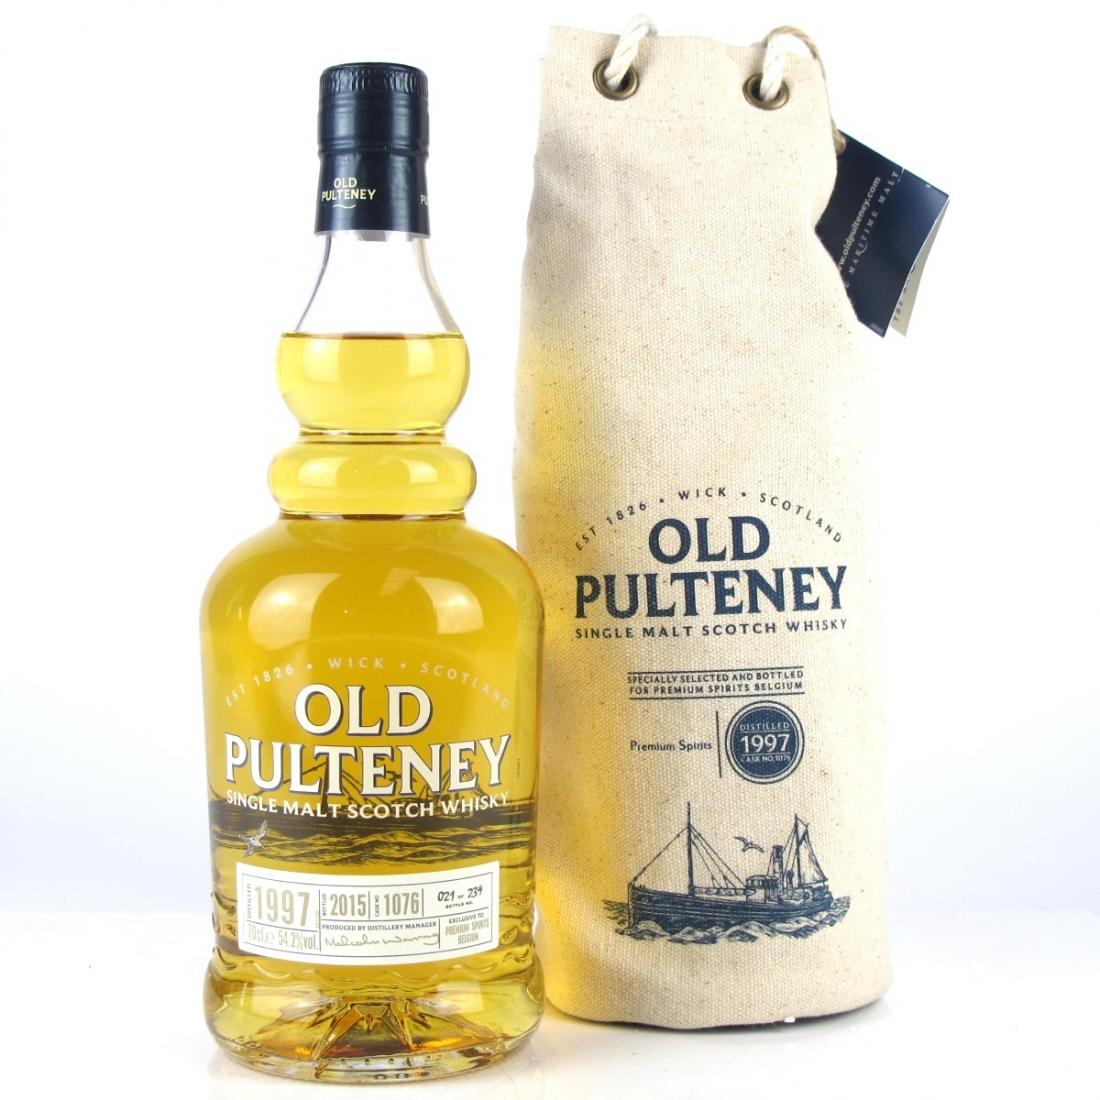 Old Pulteney 1997 Single Cask / Premium Spirits Belgium Exclusive